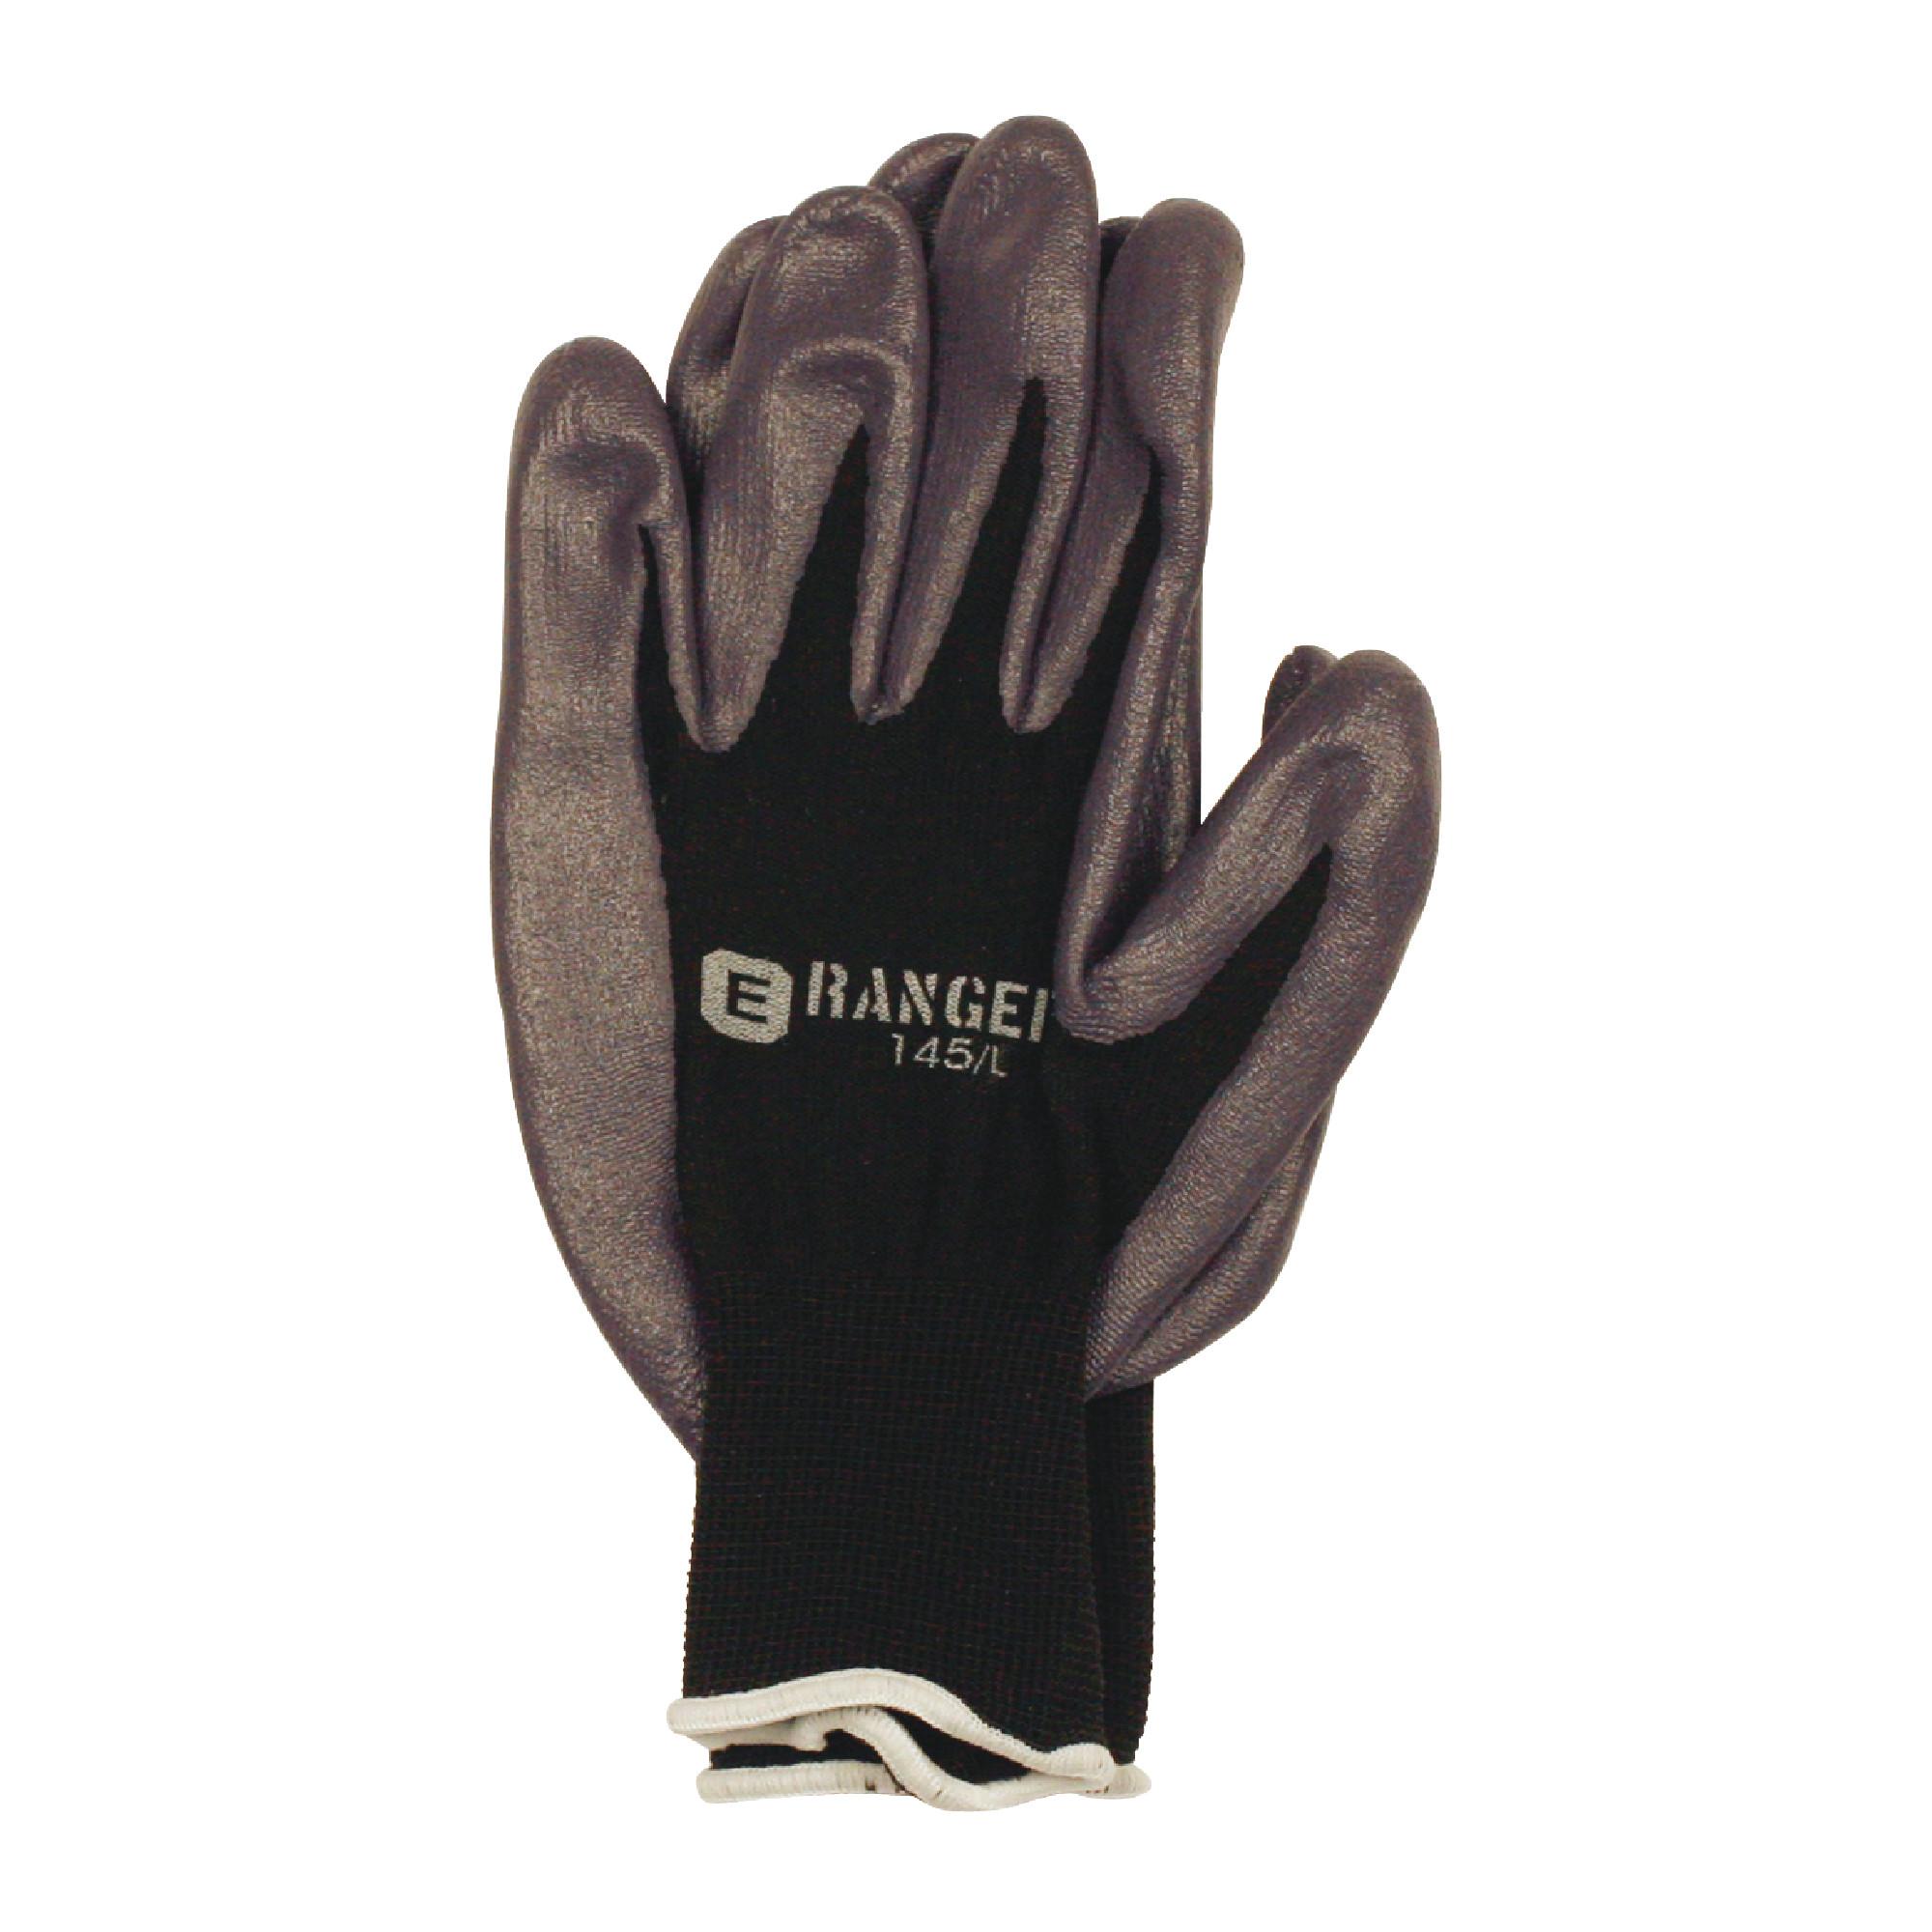 13 Gauge Nitrile Foam Dipped Glove IN Large